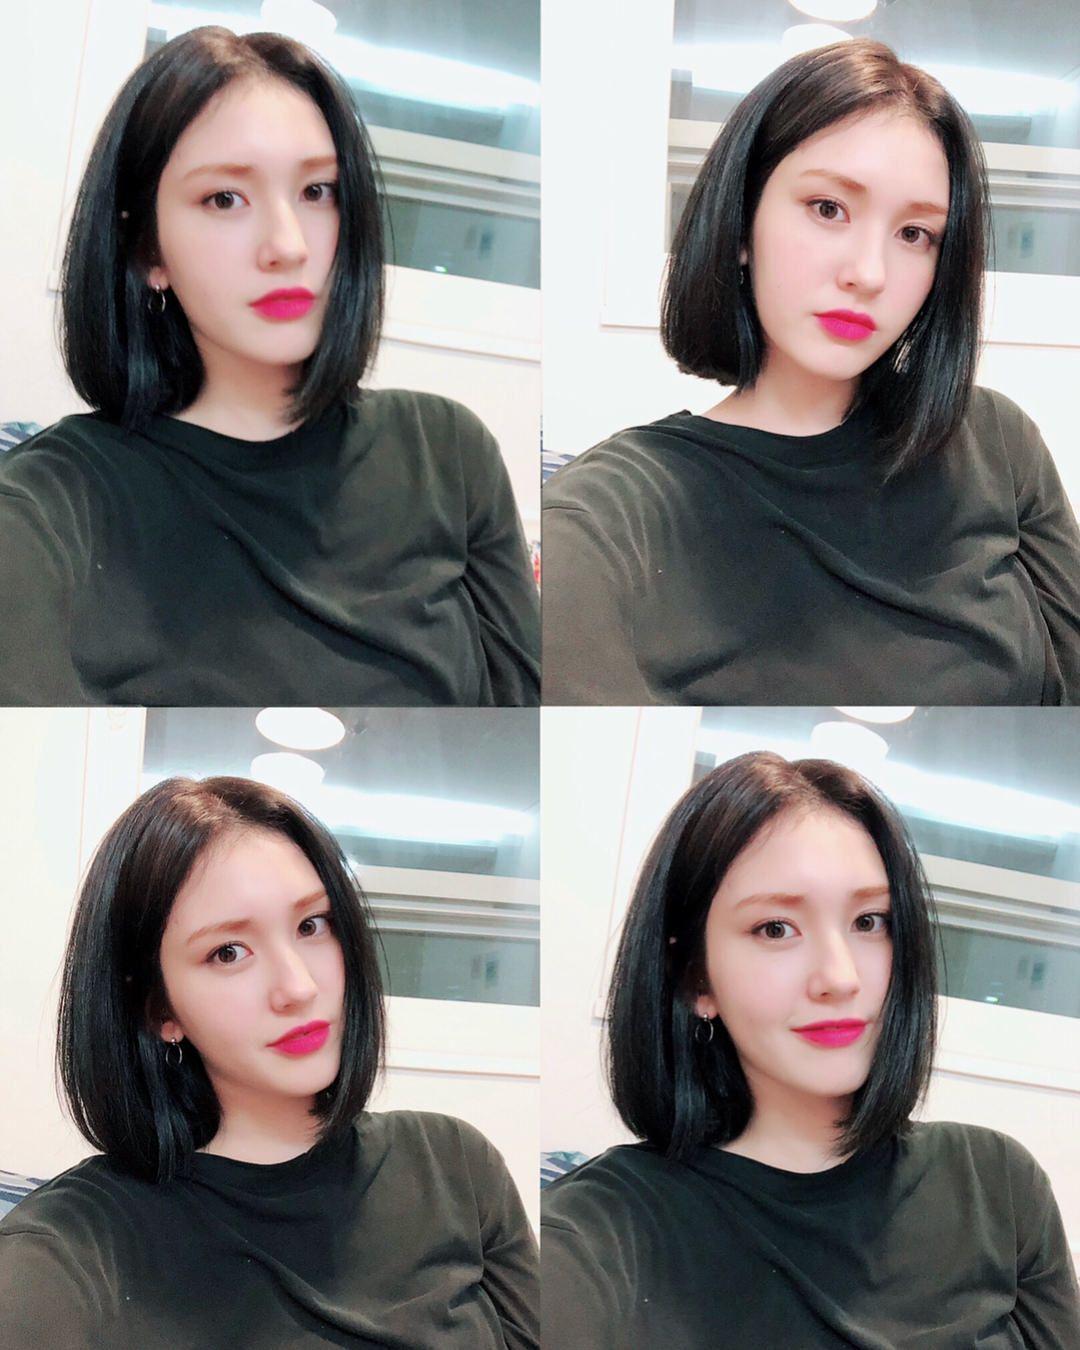 jeon somi 2018 in 2019 | jeon somi, somi, kpop hair